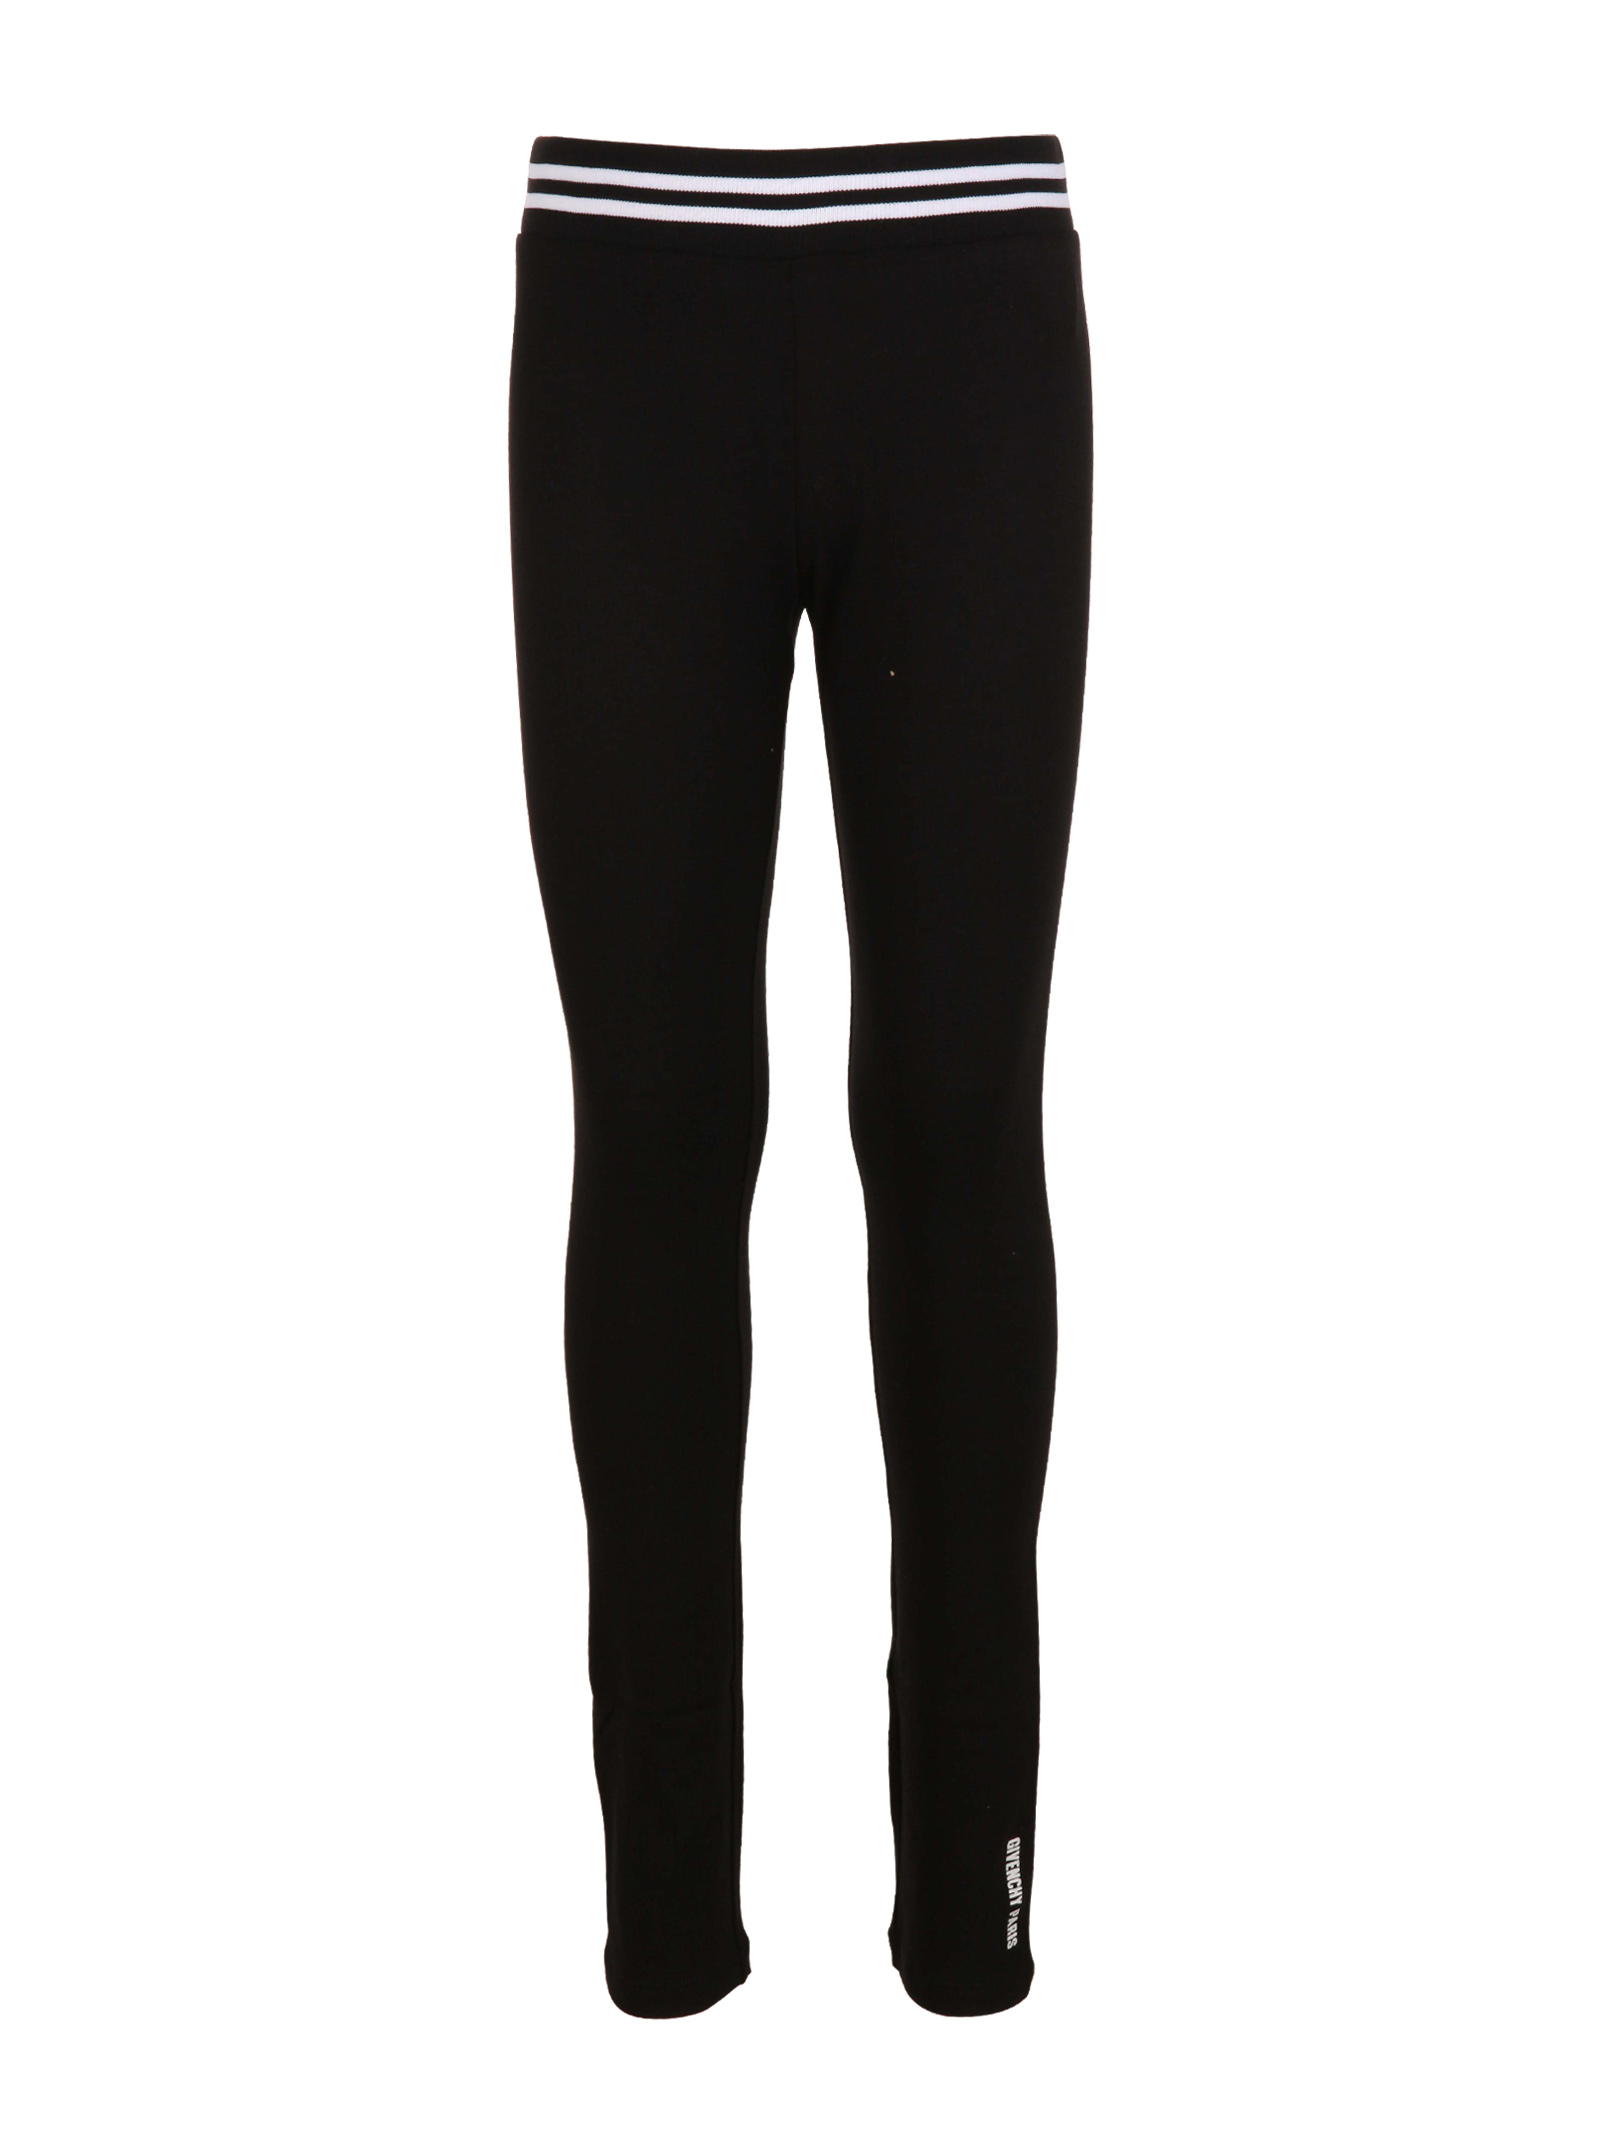 cbd234f4ed3c8 Givenchy Kids leggings - GIVENCHY kids - Michele Franzese Moda